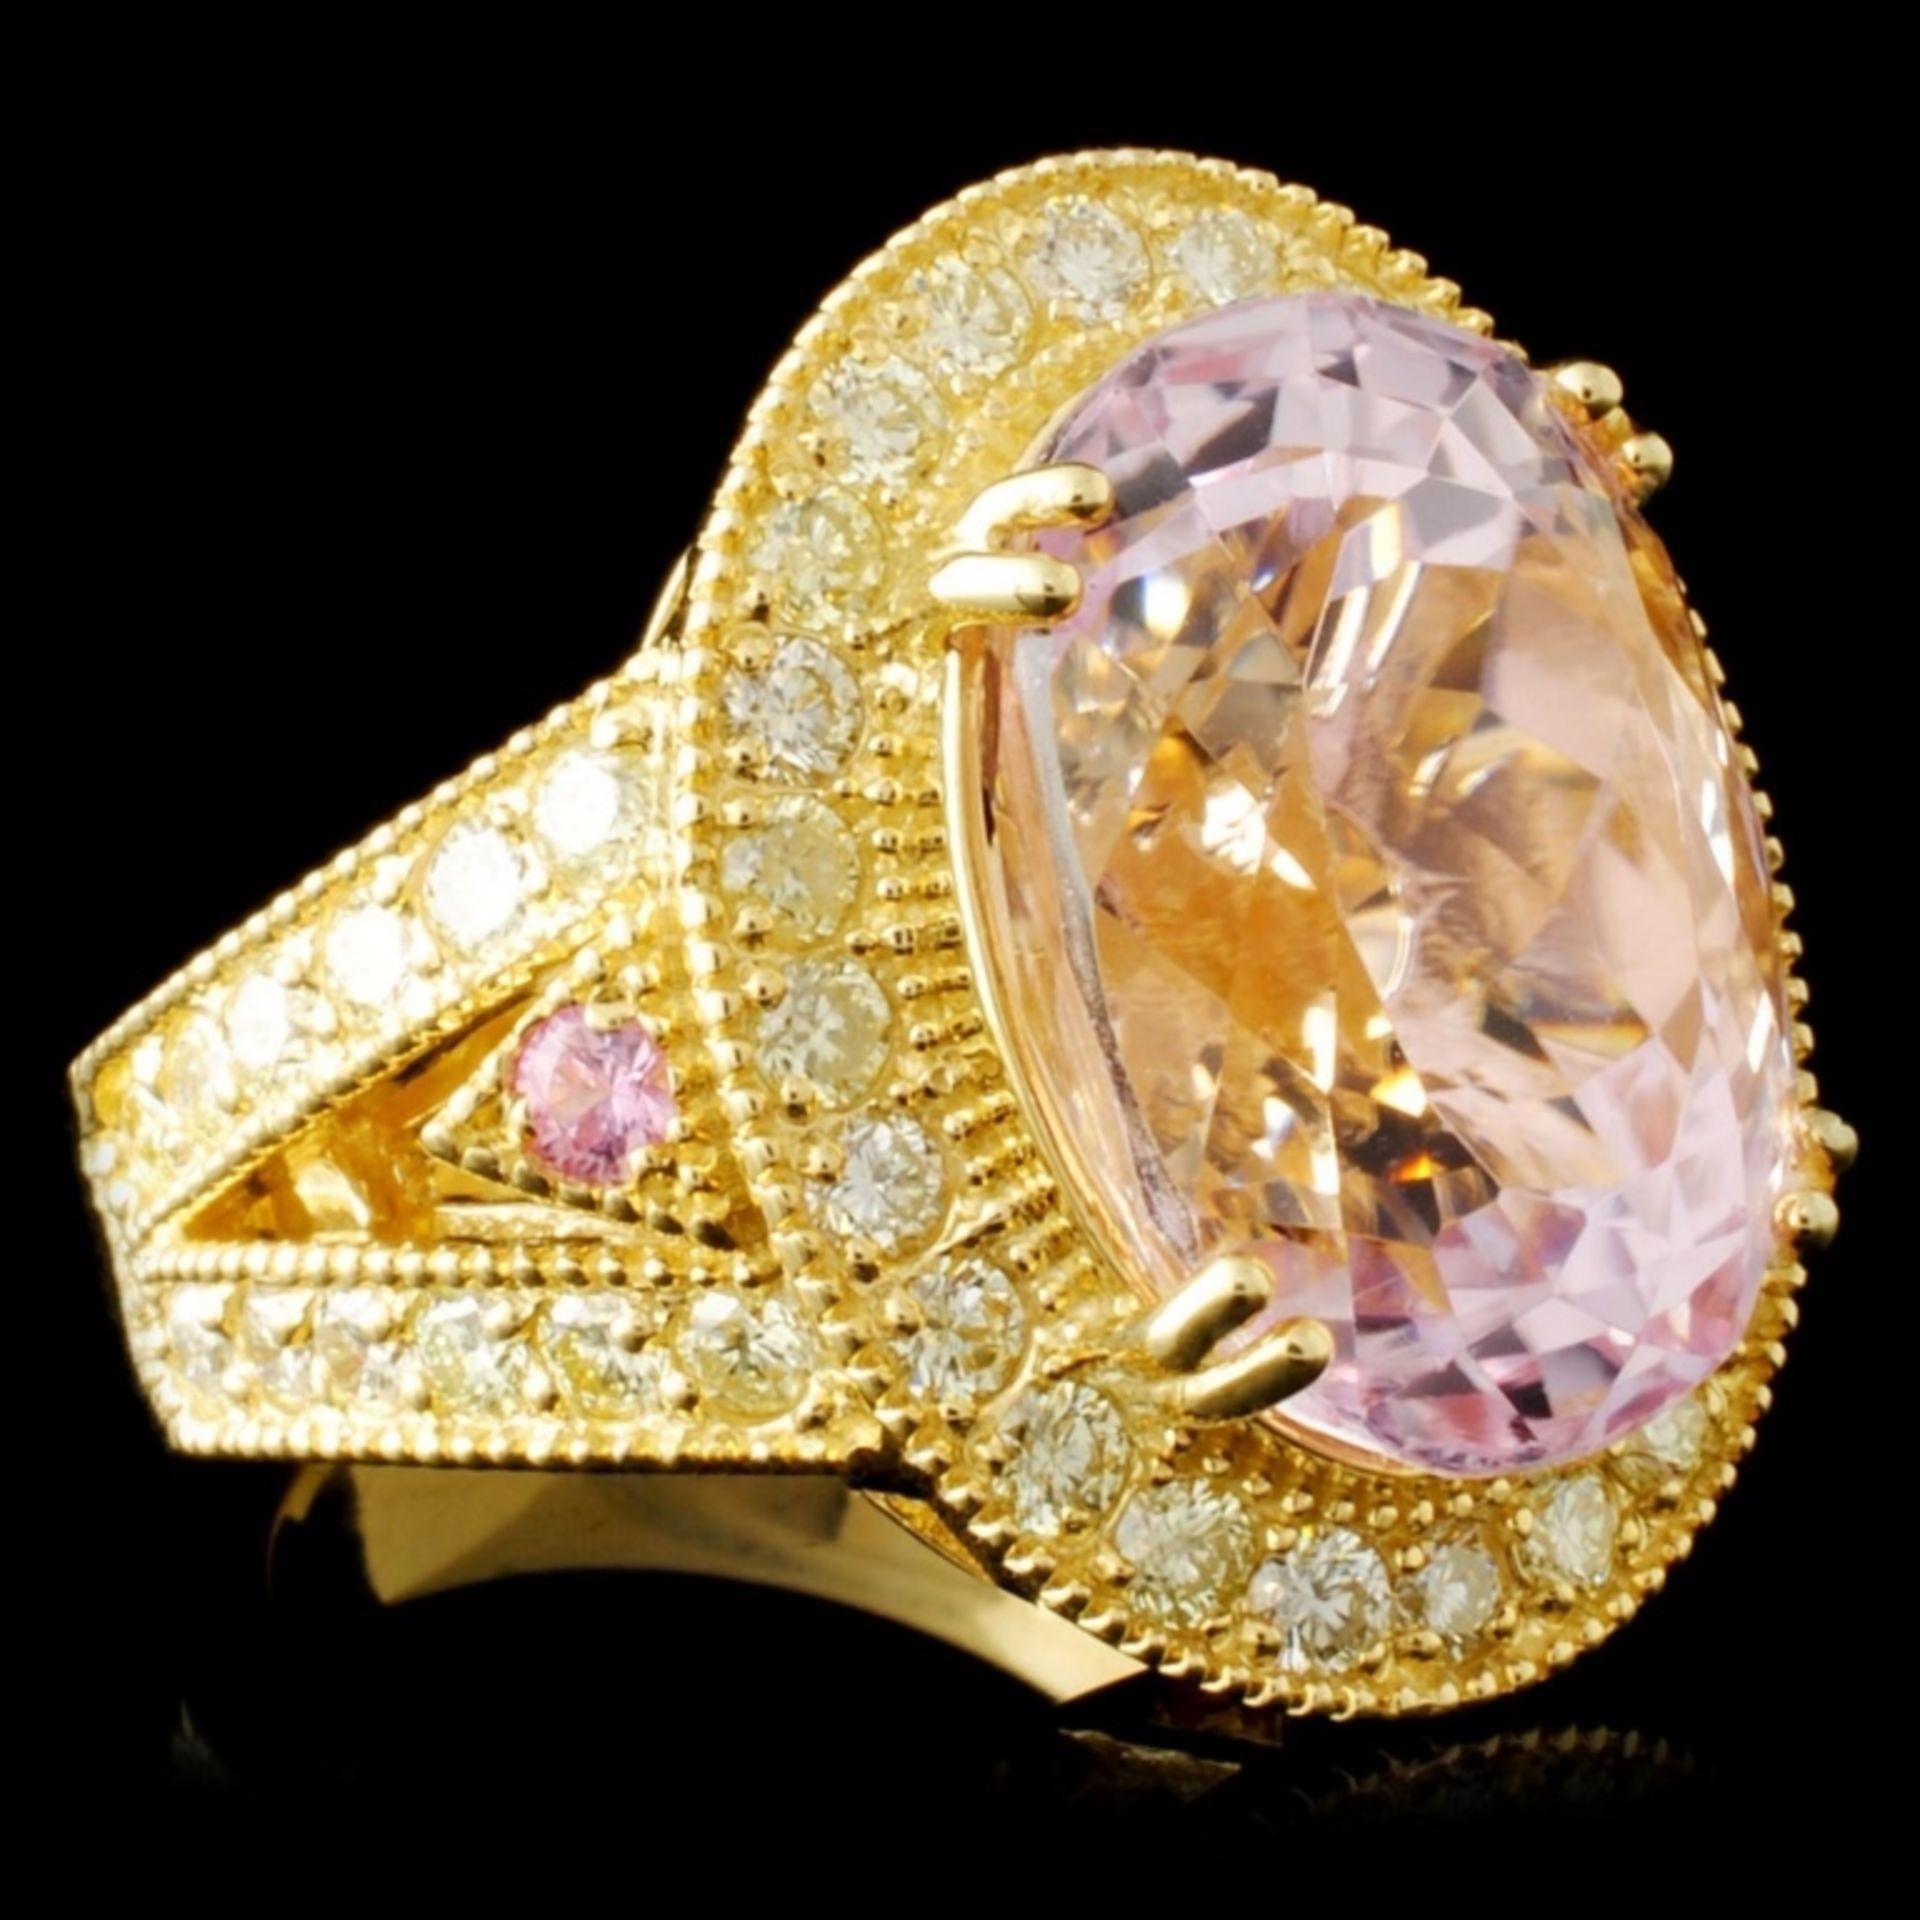 14K Gold 13.84ct Kunzite & 1.72ctw Diamond Ring - Image 3 of 5